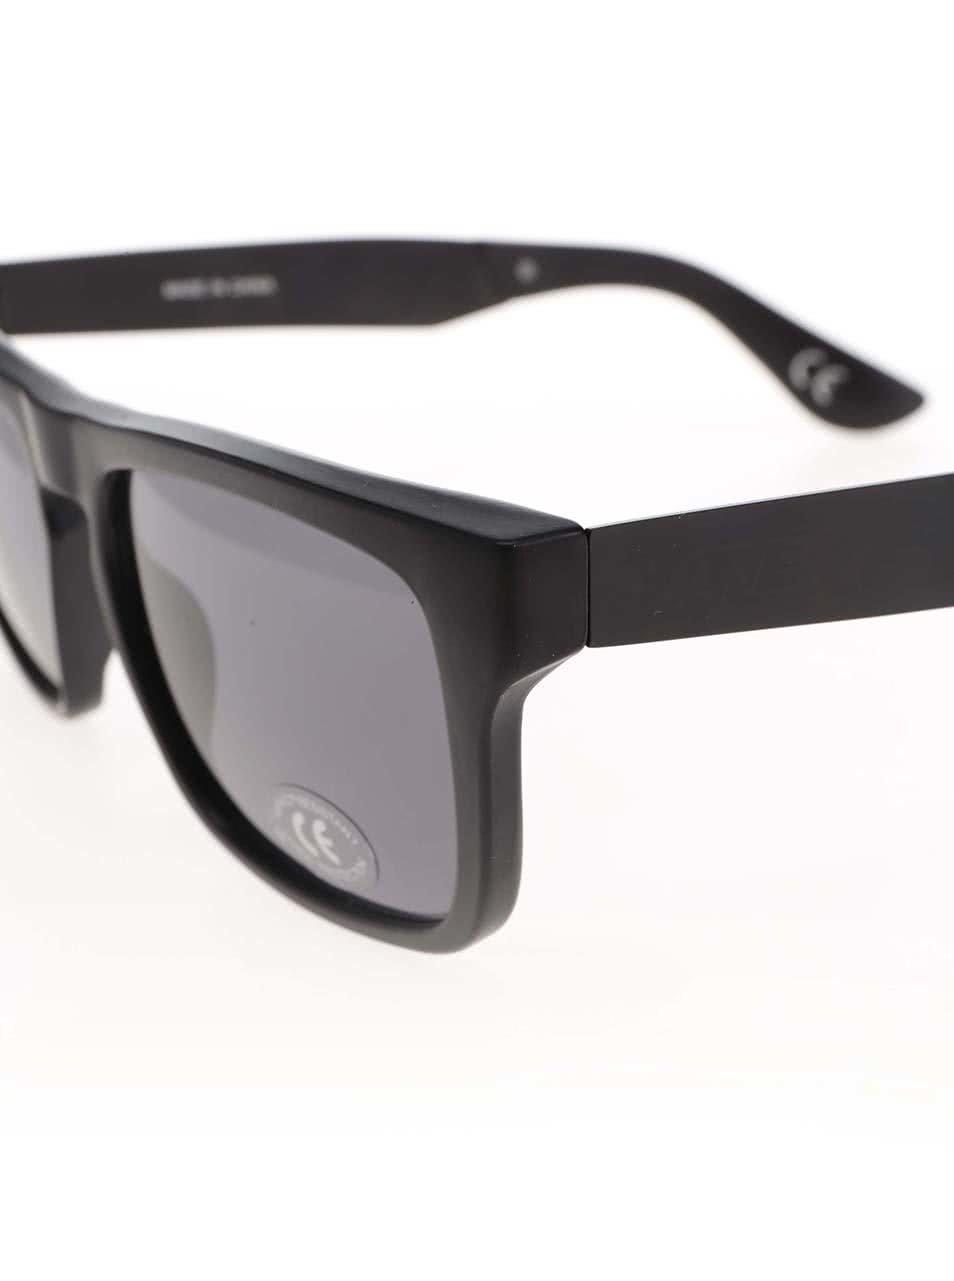 1d5fdaef0 Čierne pánske slnečné okuliare VANS | ZOOT.sk